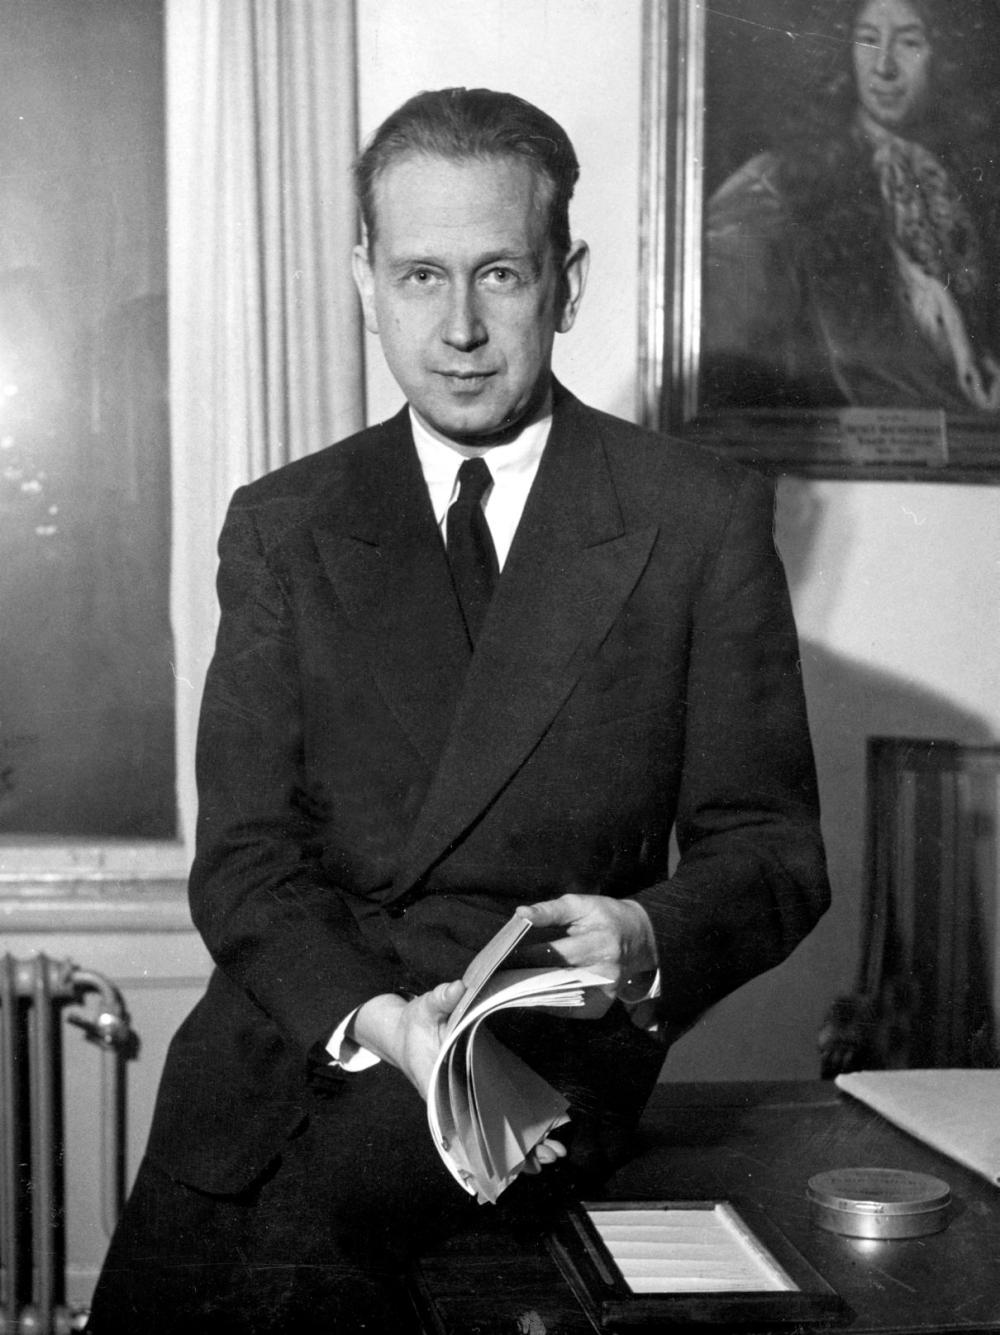 1953 - Dag Hammarskjöld, generalsekreterare FN Foto: Pressens Bild  Kod: 190 COPYRIGHT PRESSENS BILD